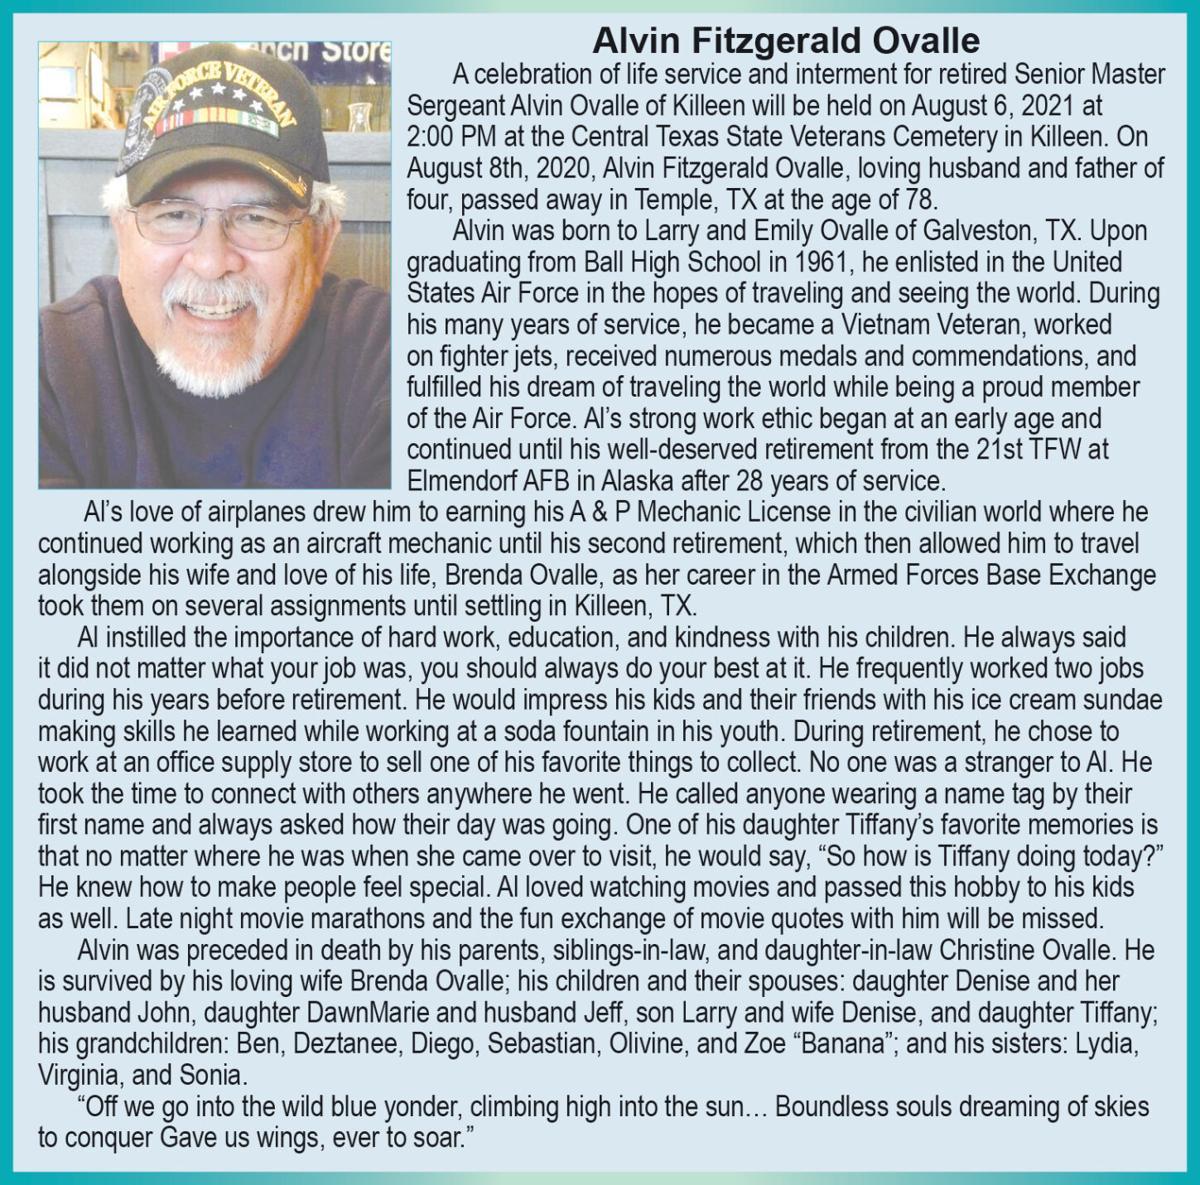 Alvin Fitzgerald Ovalle